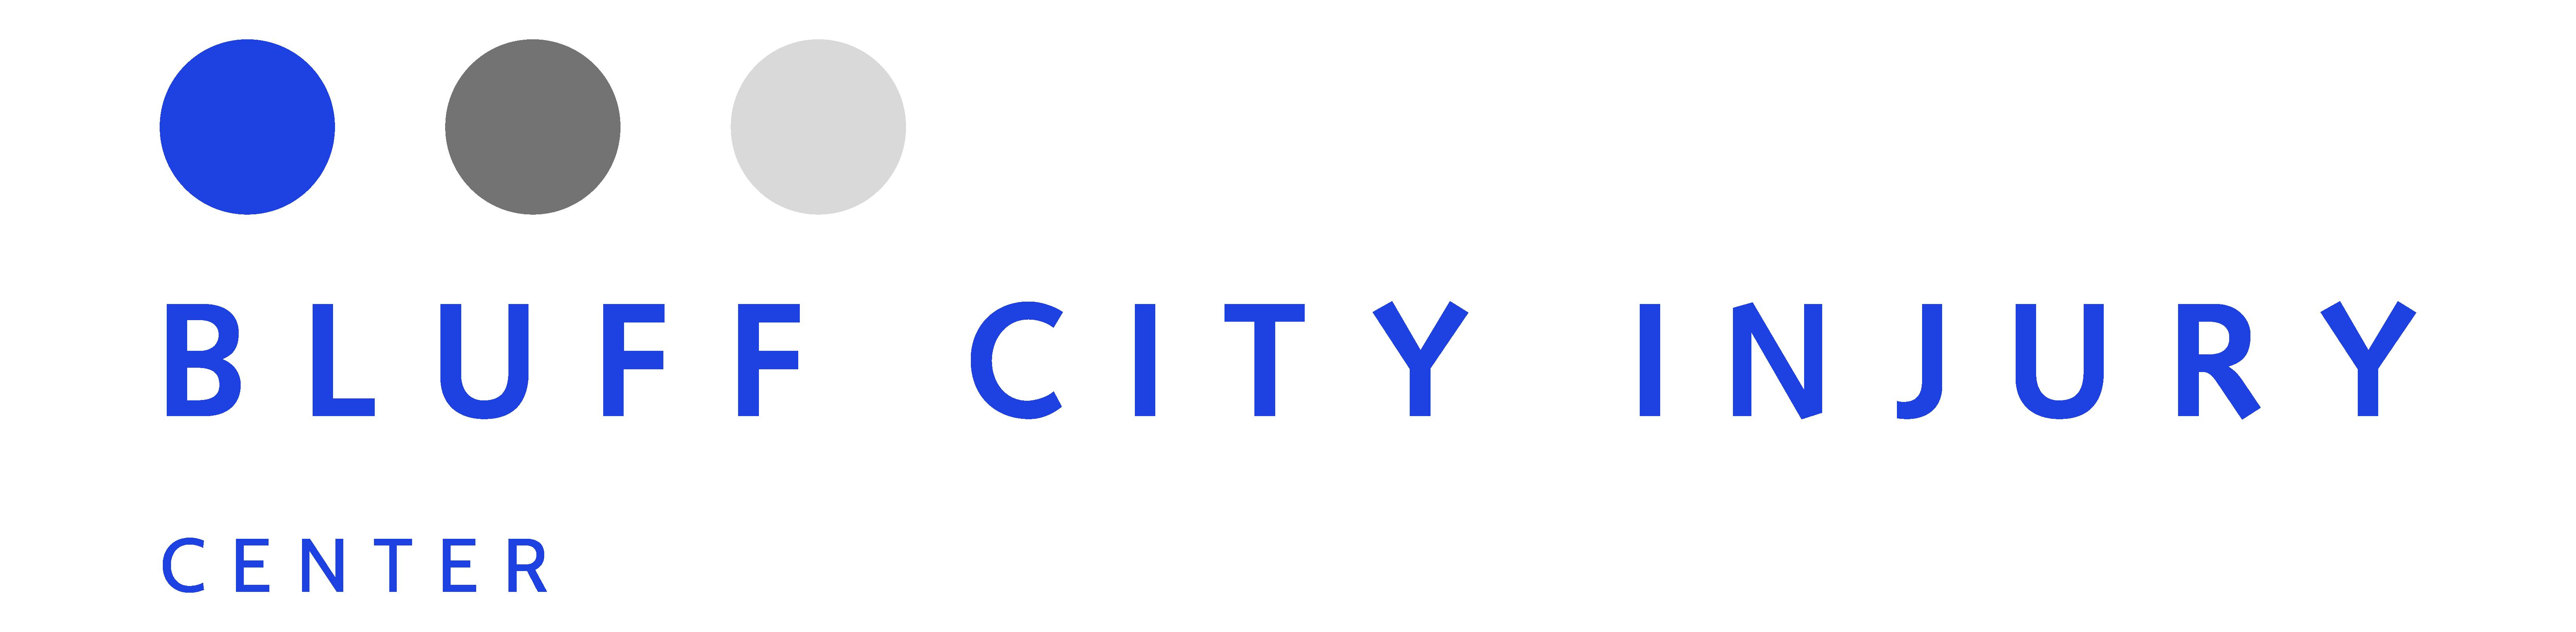 bluff city injury center logo